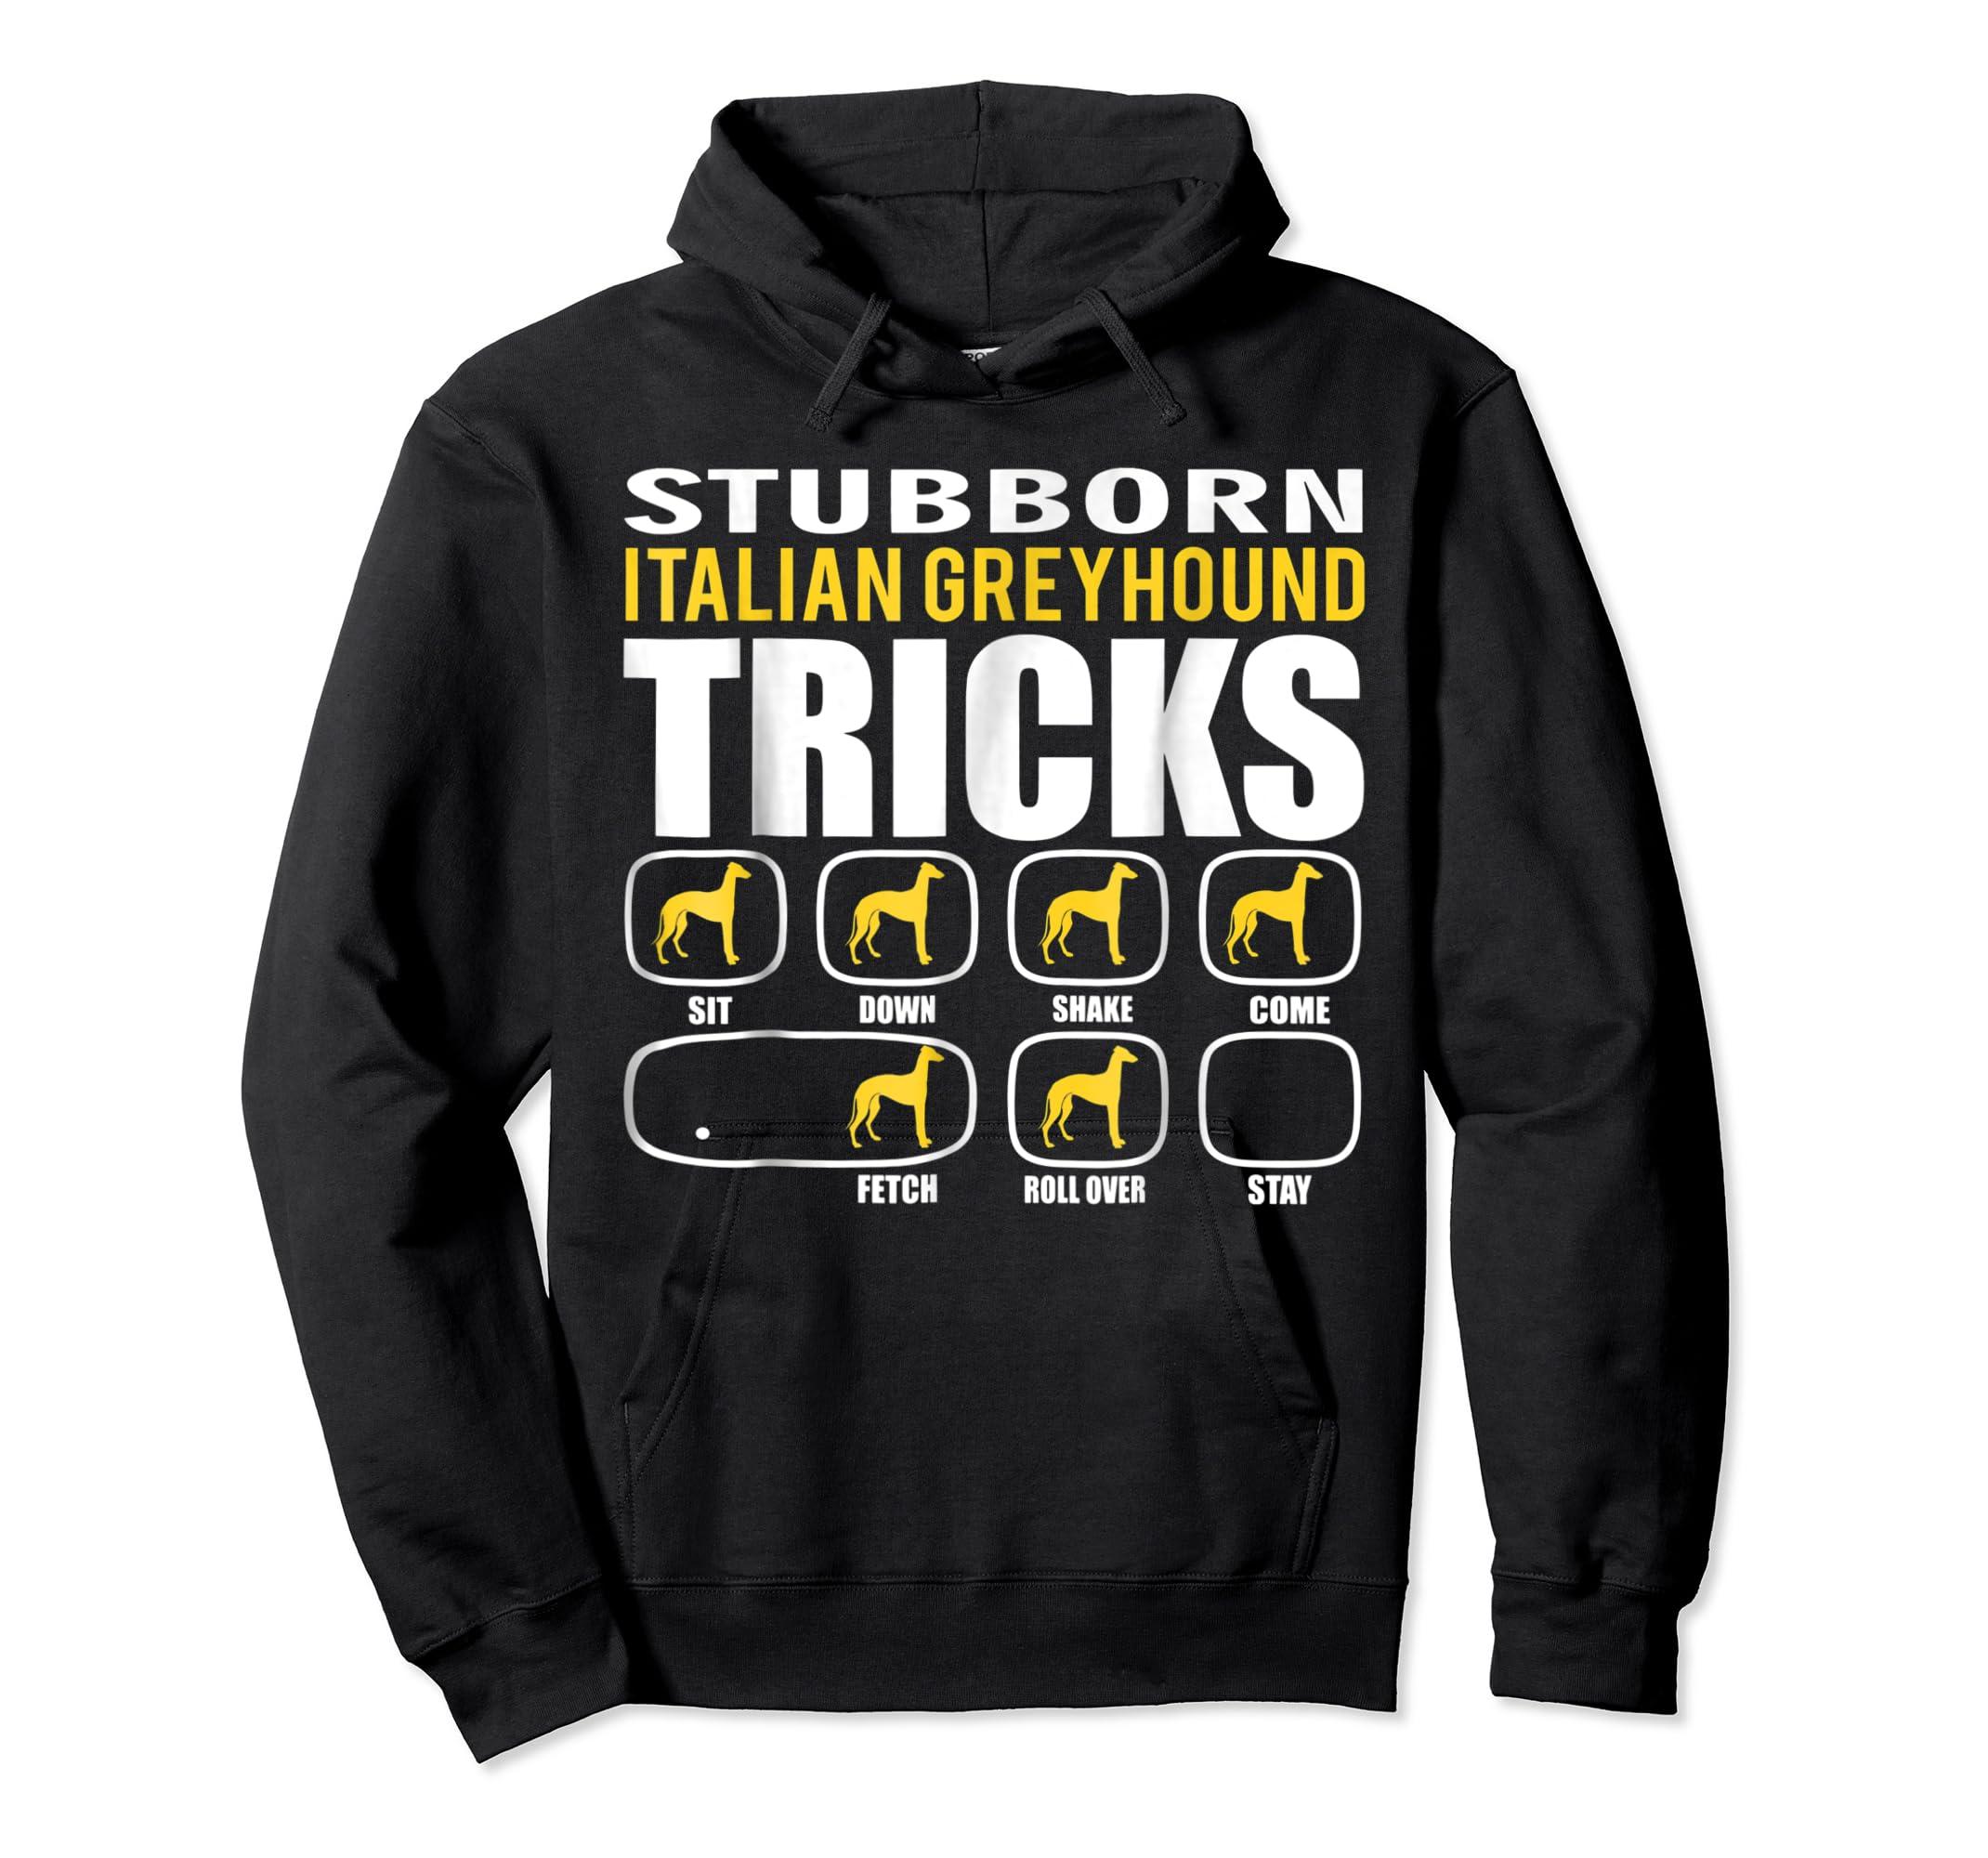 Funny Stubborn Italian Greyhound Tricks T-Shirt-Hoodie-Black